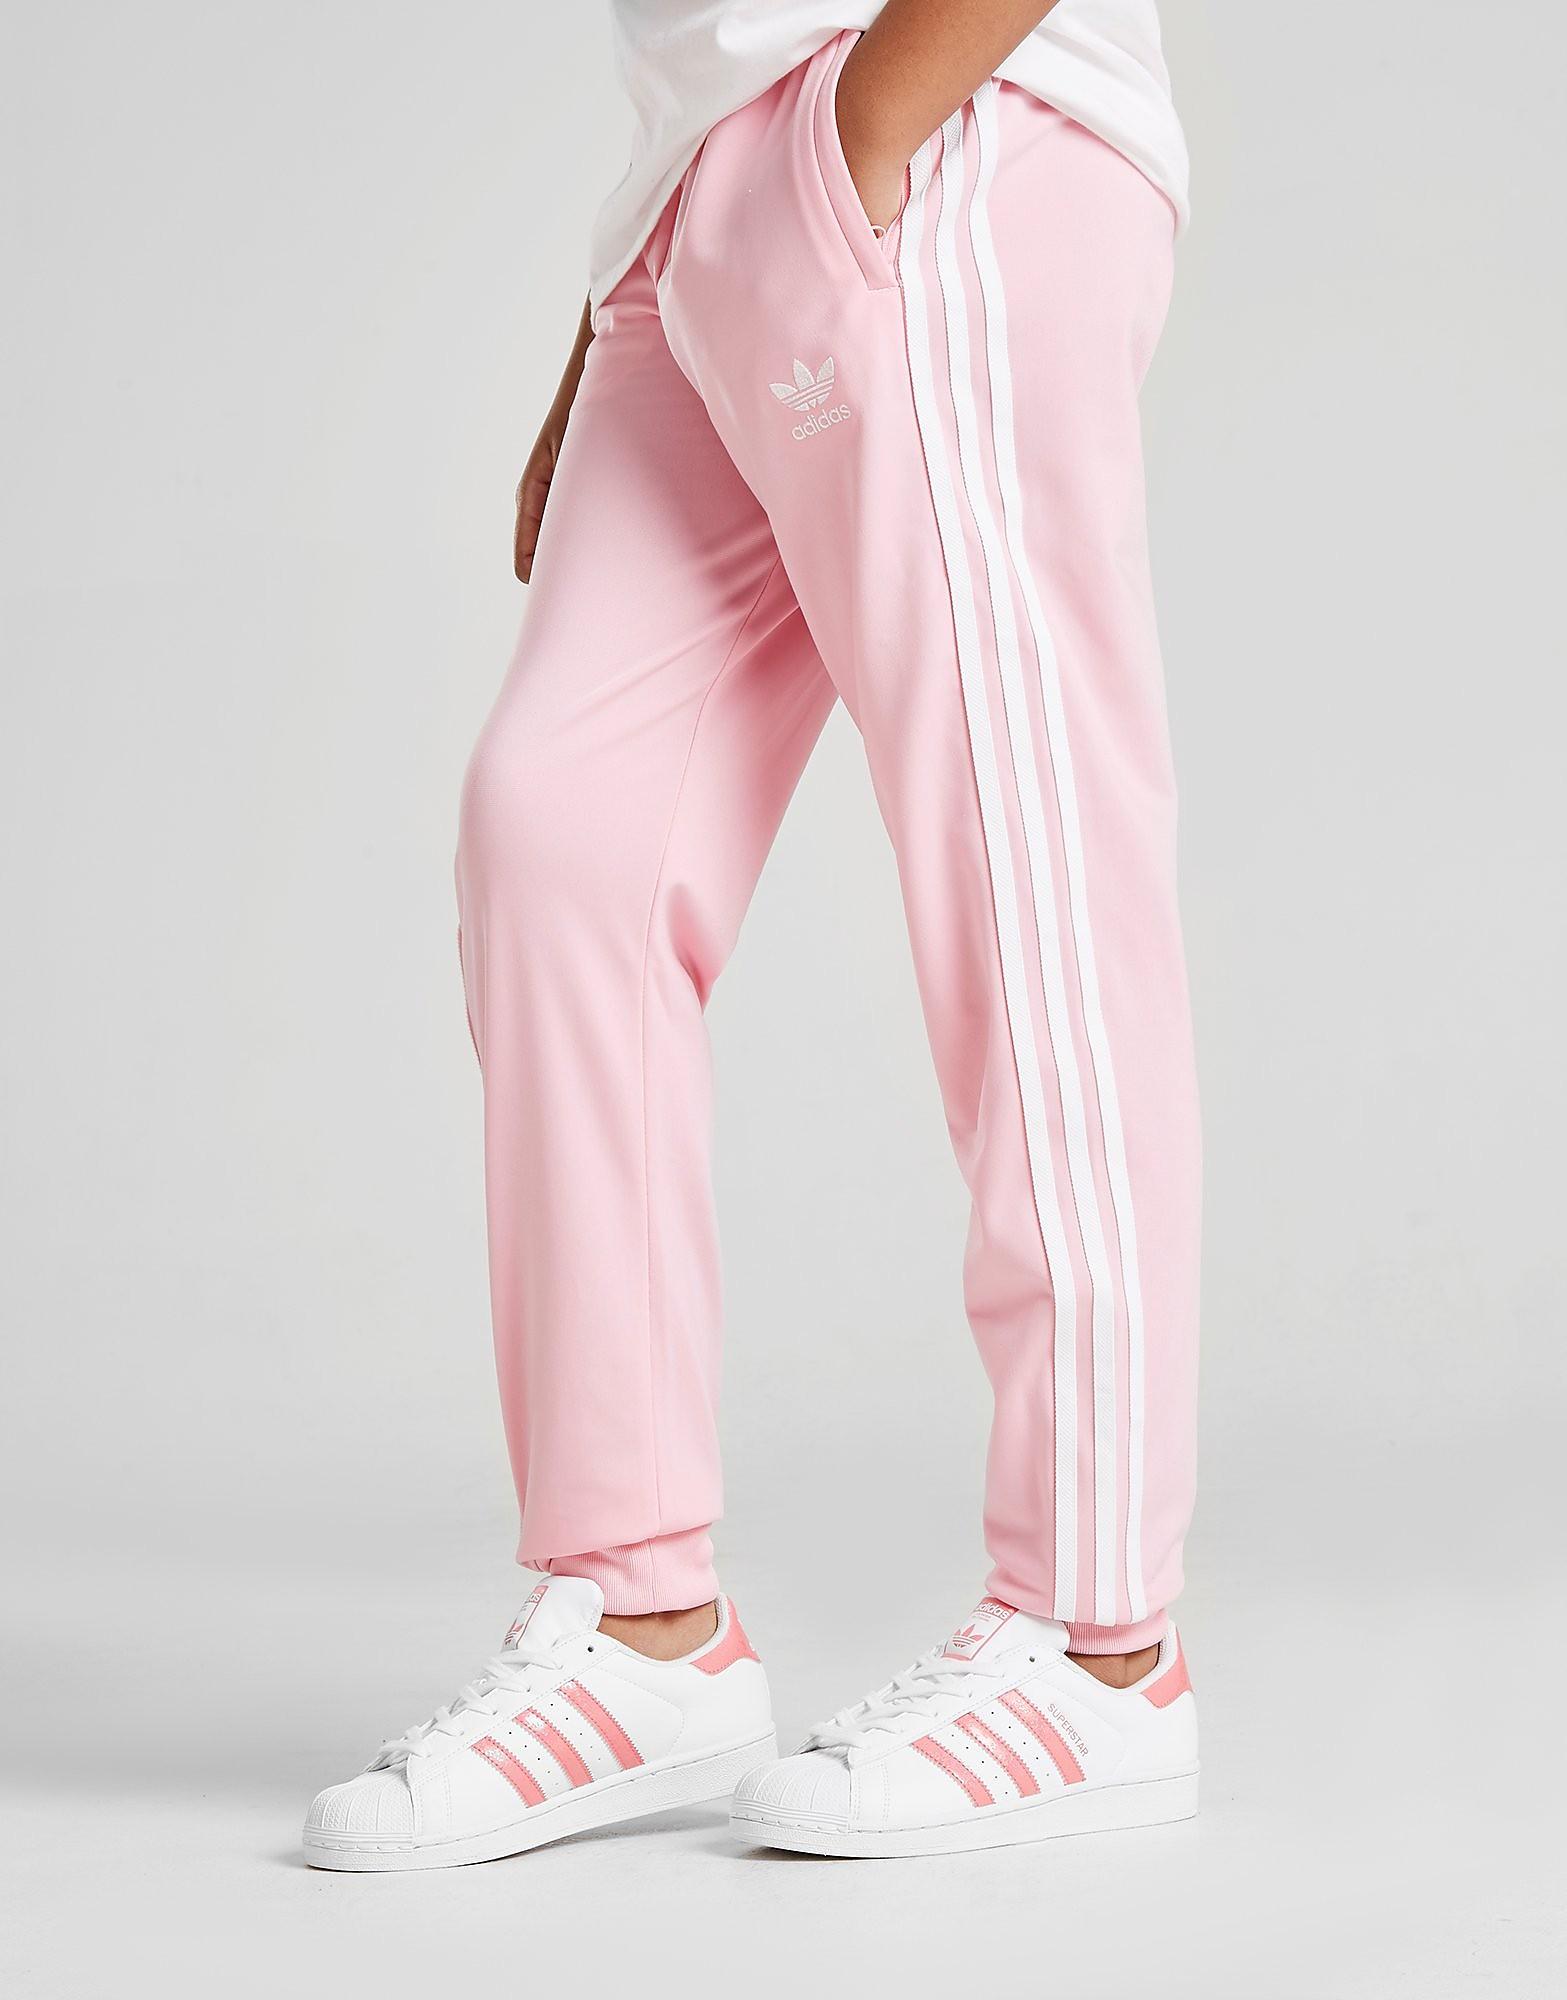 adidas Originals Girls' Superstar Track Pants Junior - Roze - Kind